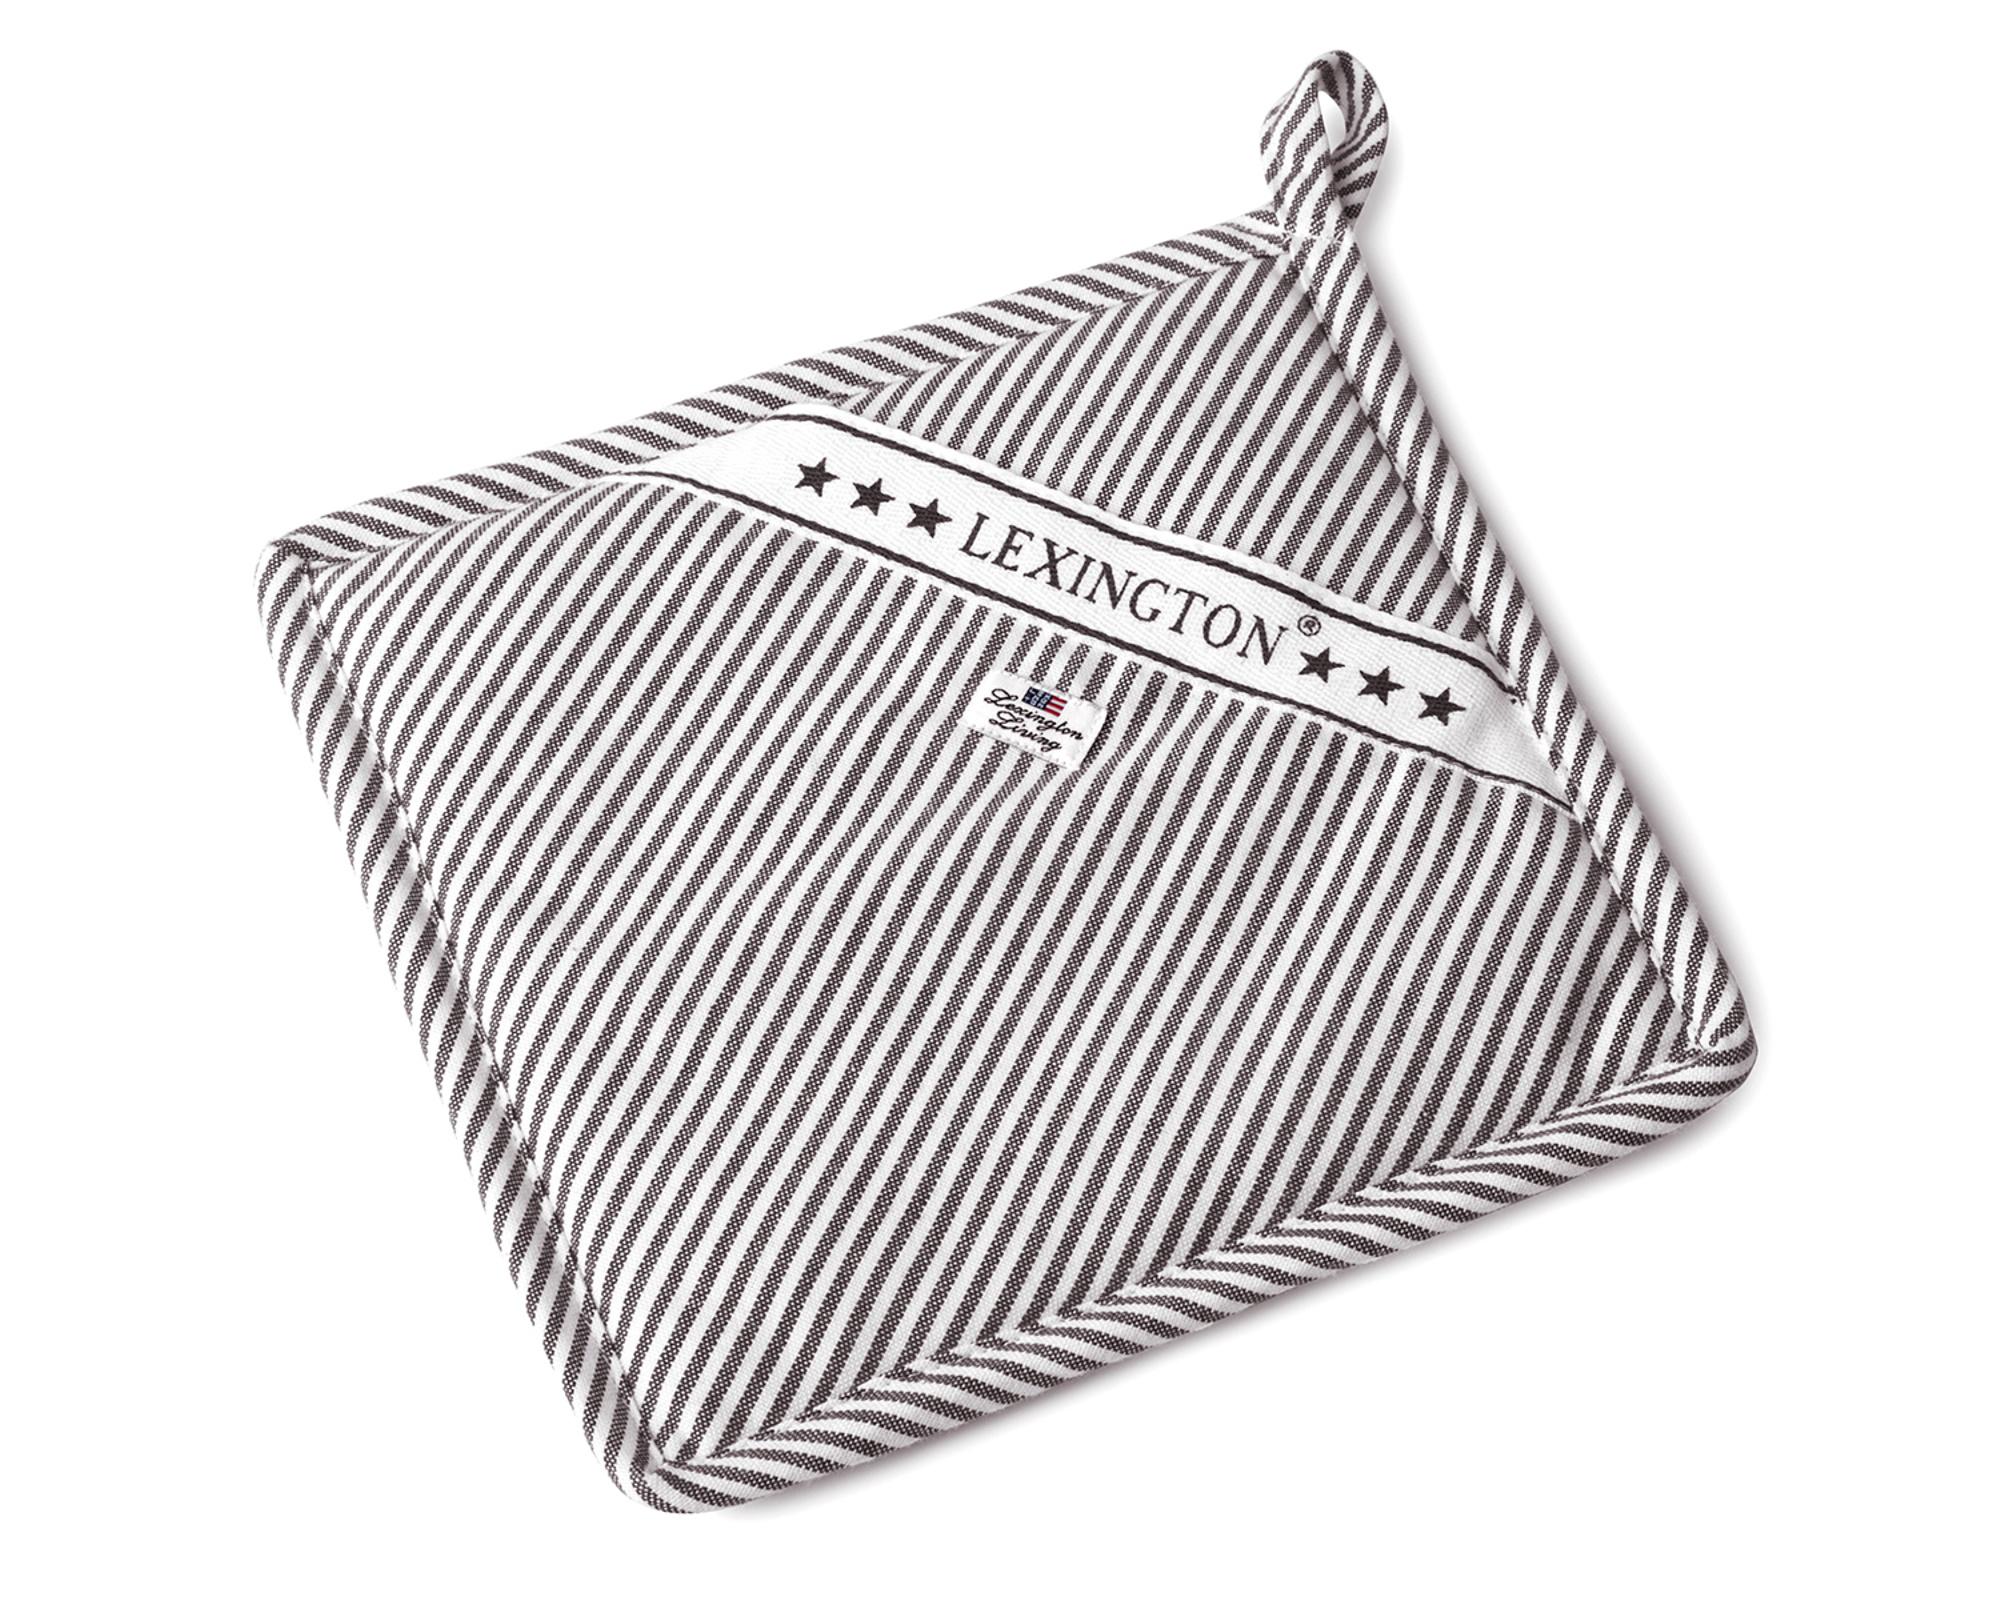 Icons Oxford Dark Gray/White Striped Potholder